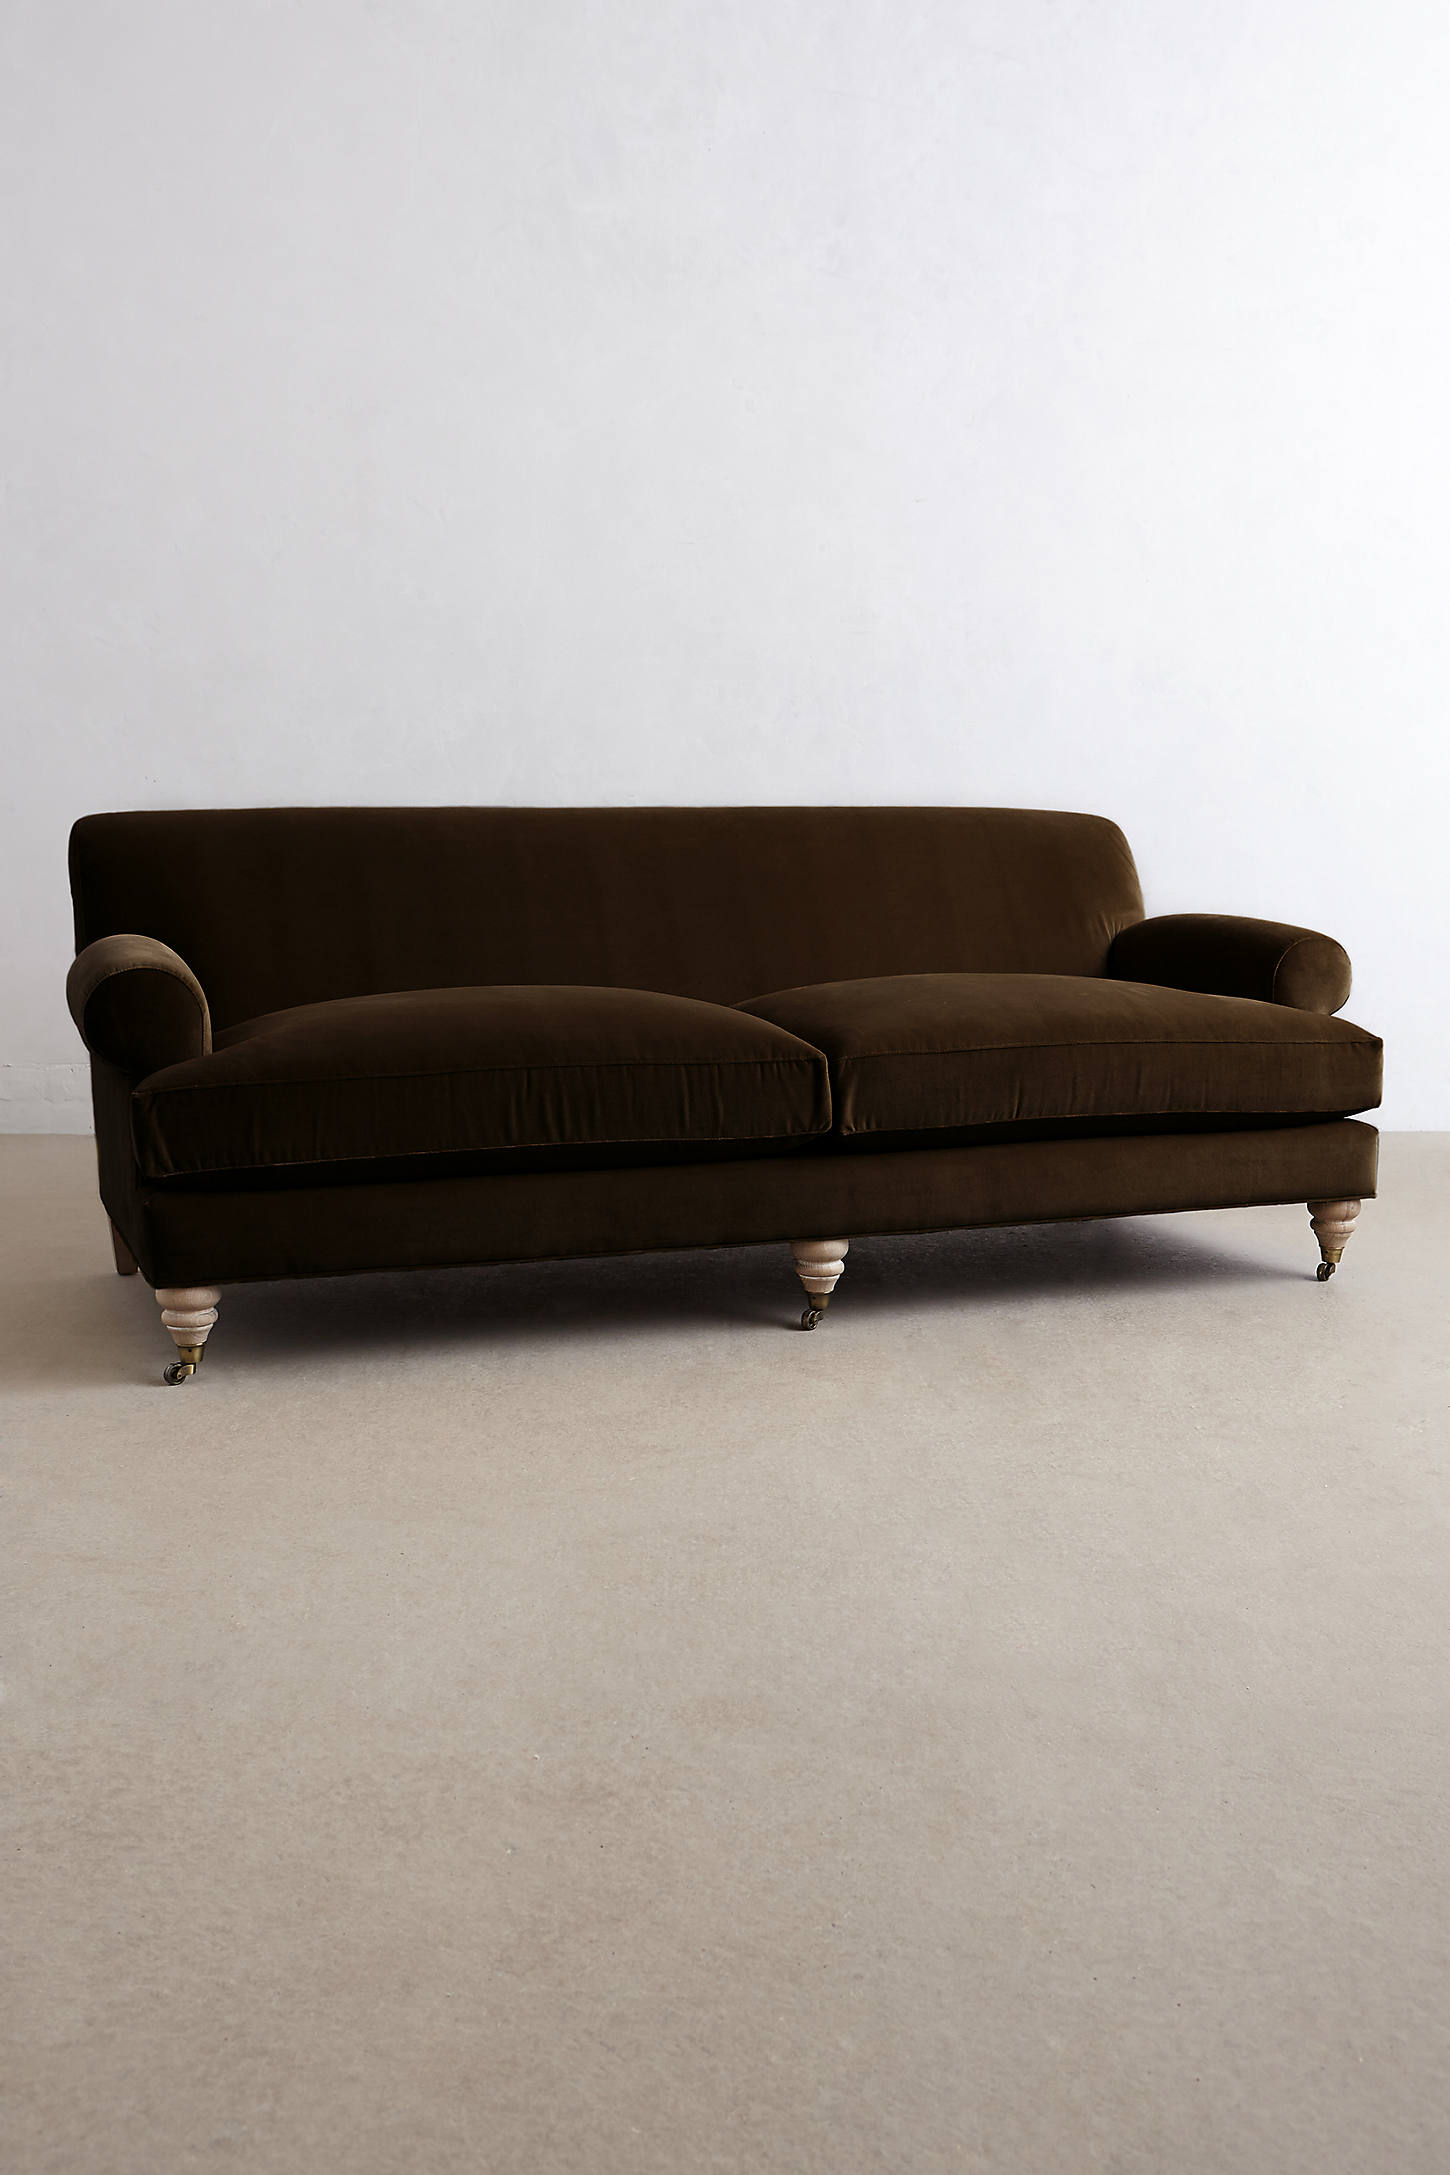 Velvet Willoughby Sofa, Wilcox